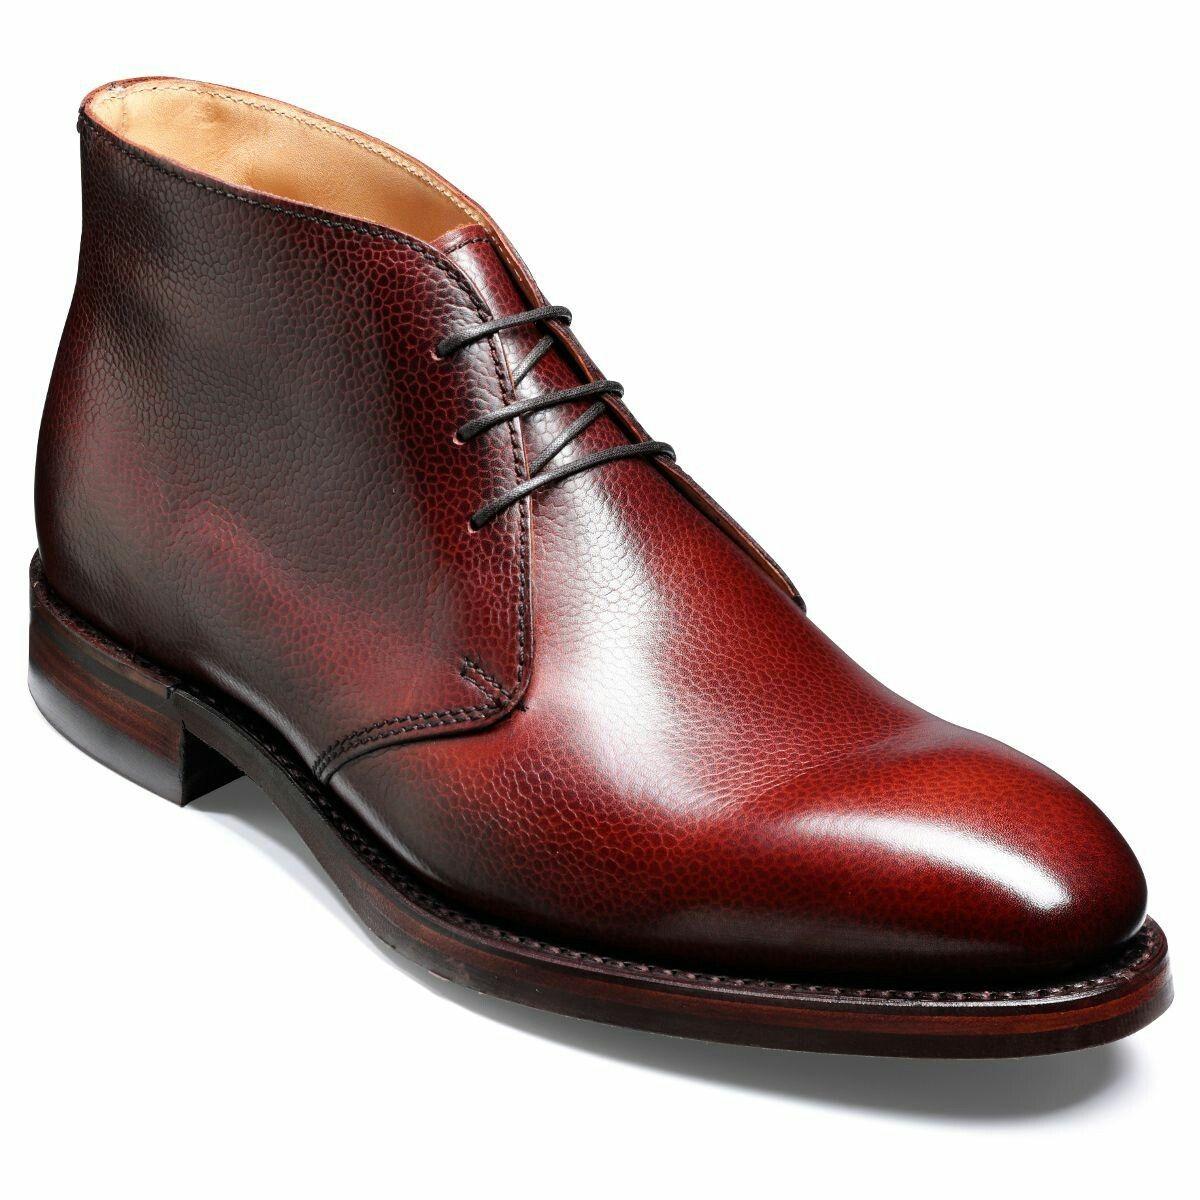 Men S Burgundy Ankle Genuine Leather Chukka Boots Men Dress Leather Chukka Boot Boots Chukka Boots Men Chukka Boots Leather Chukka Boots